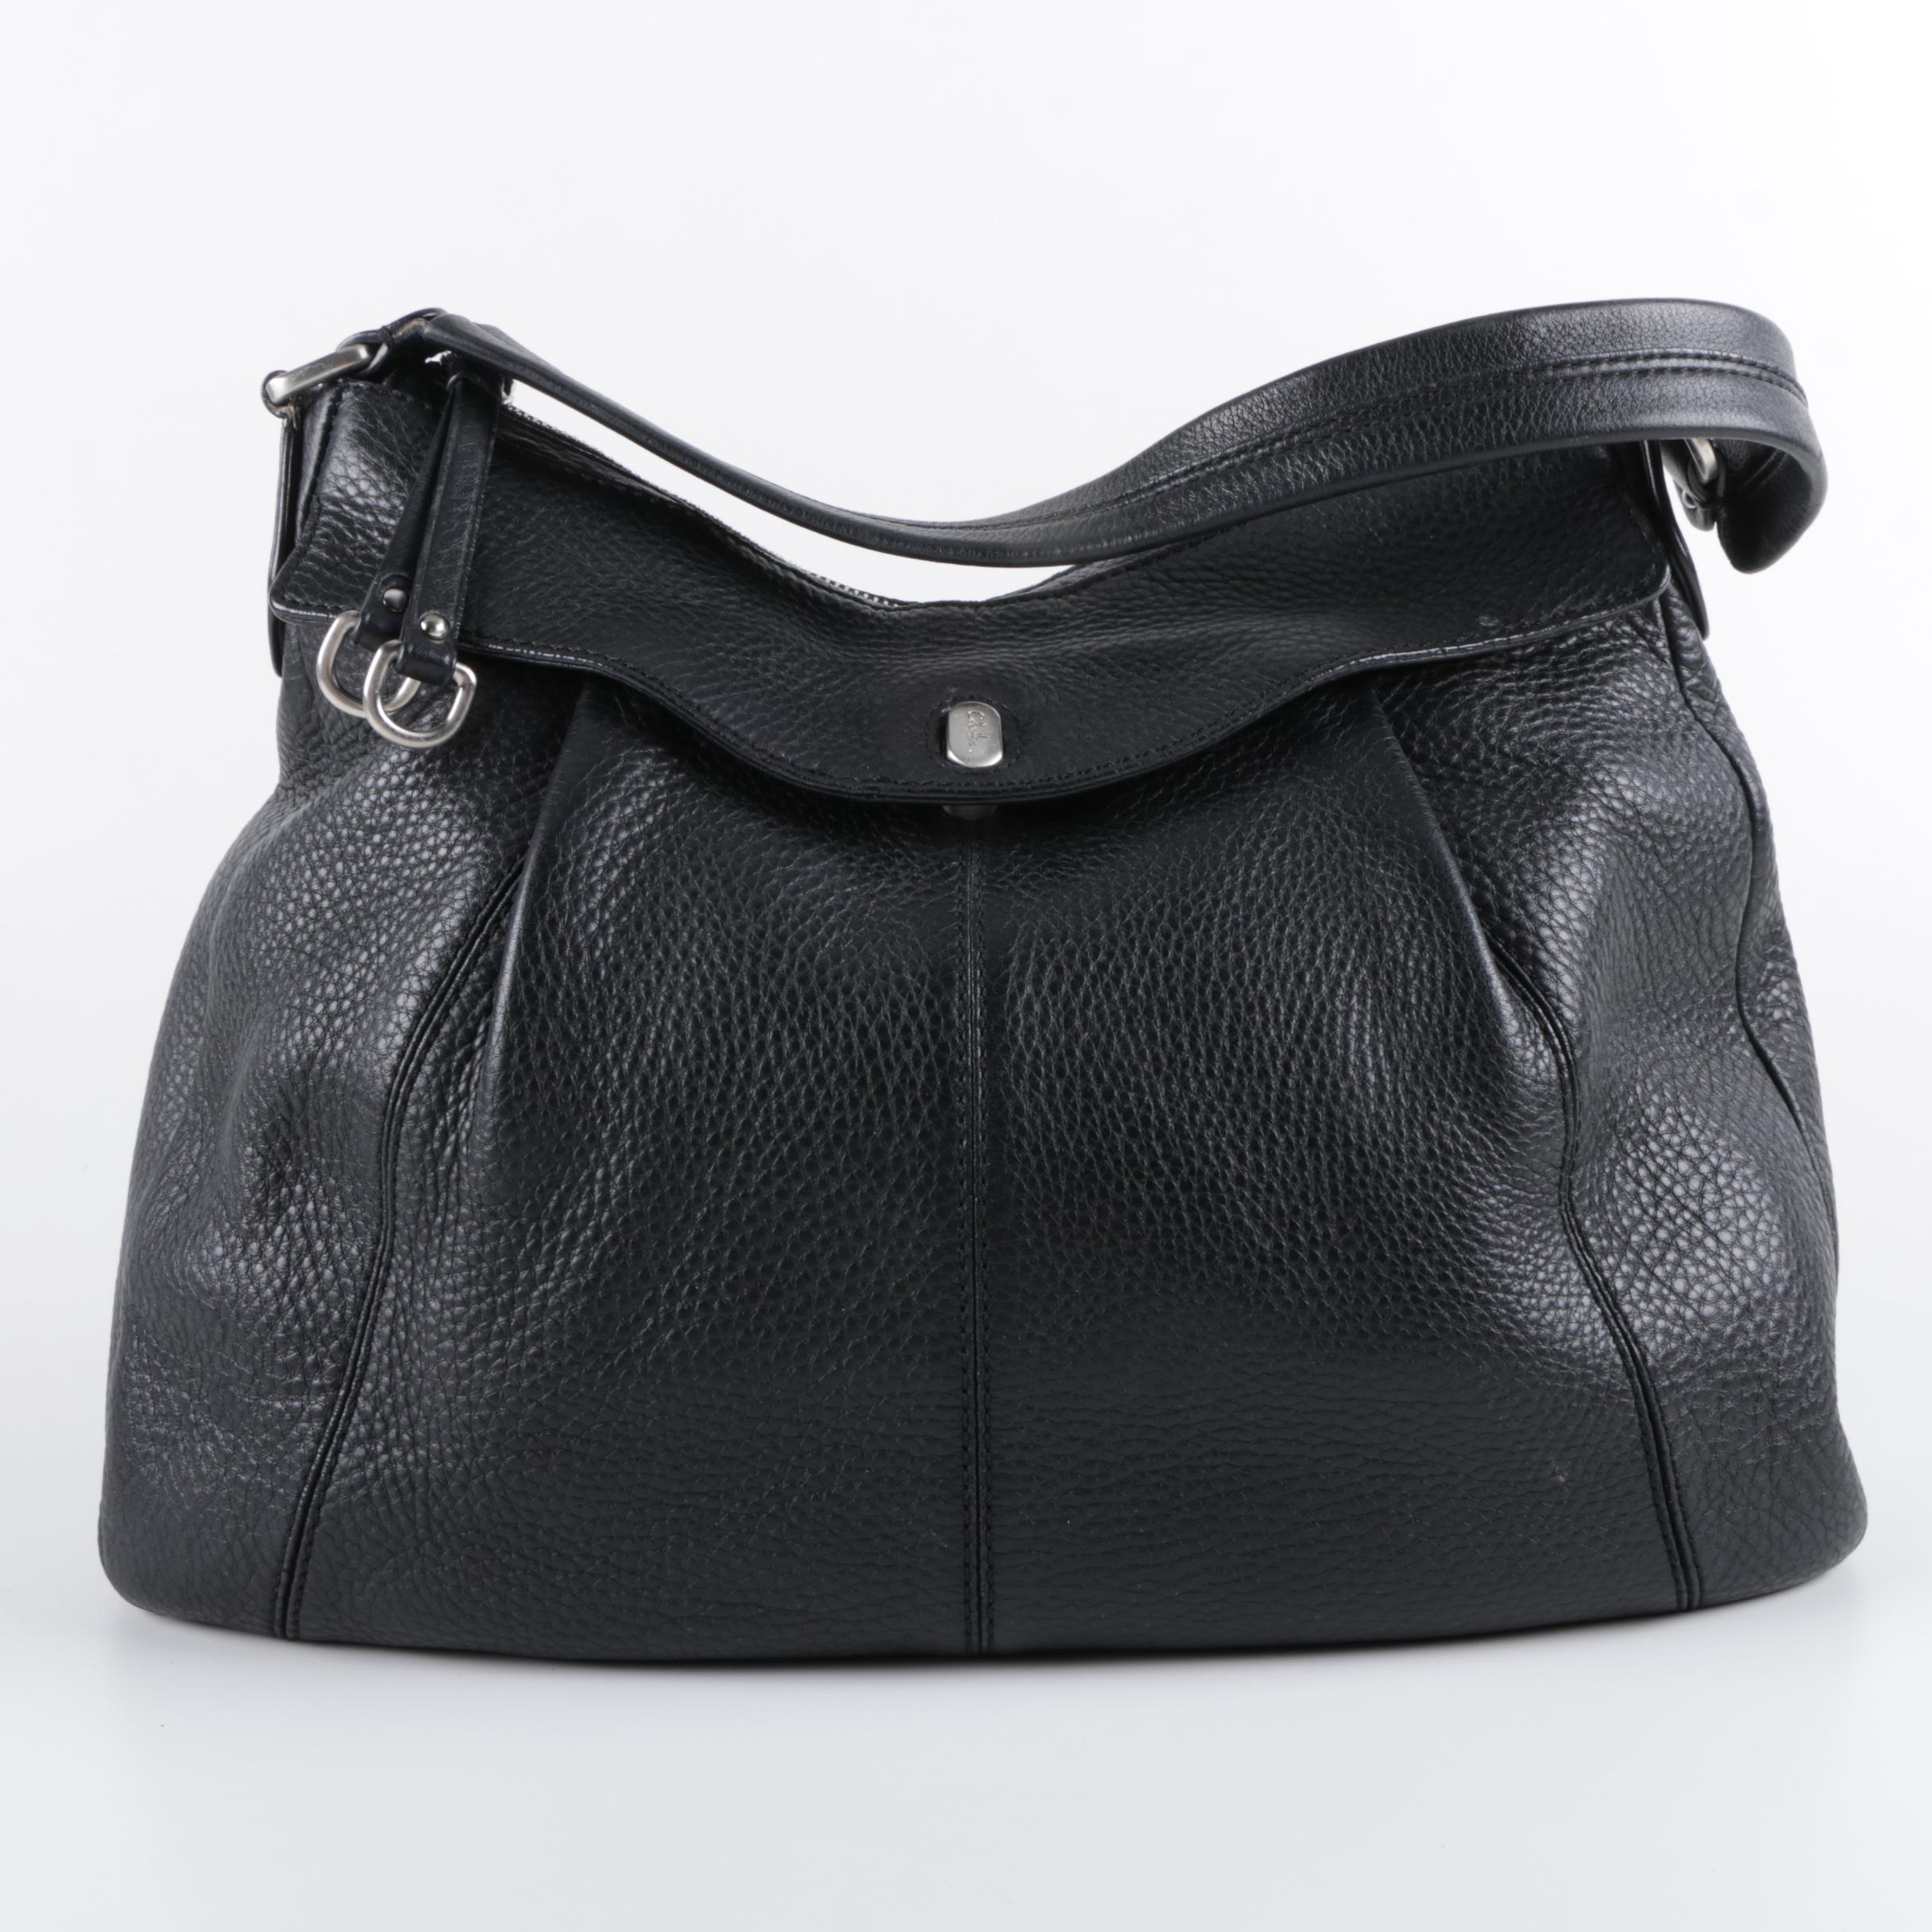 Cole Haan Black Pebbled Leather Hobo Bag